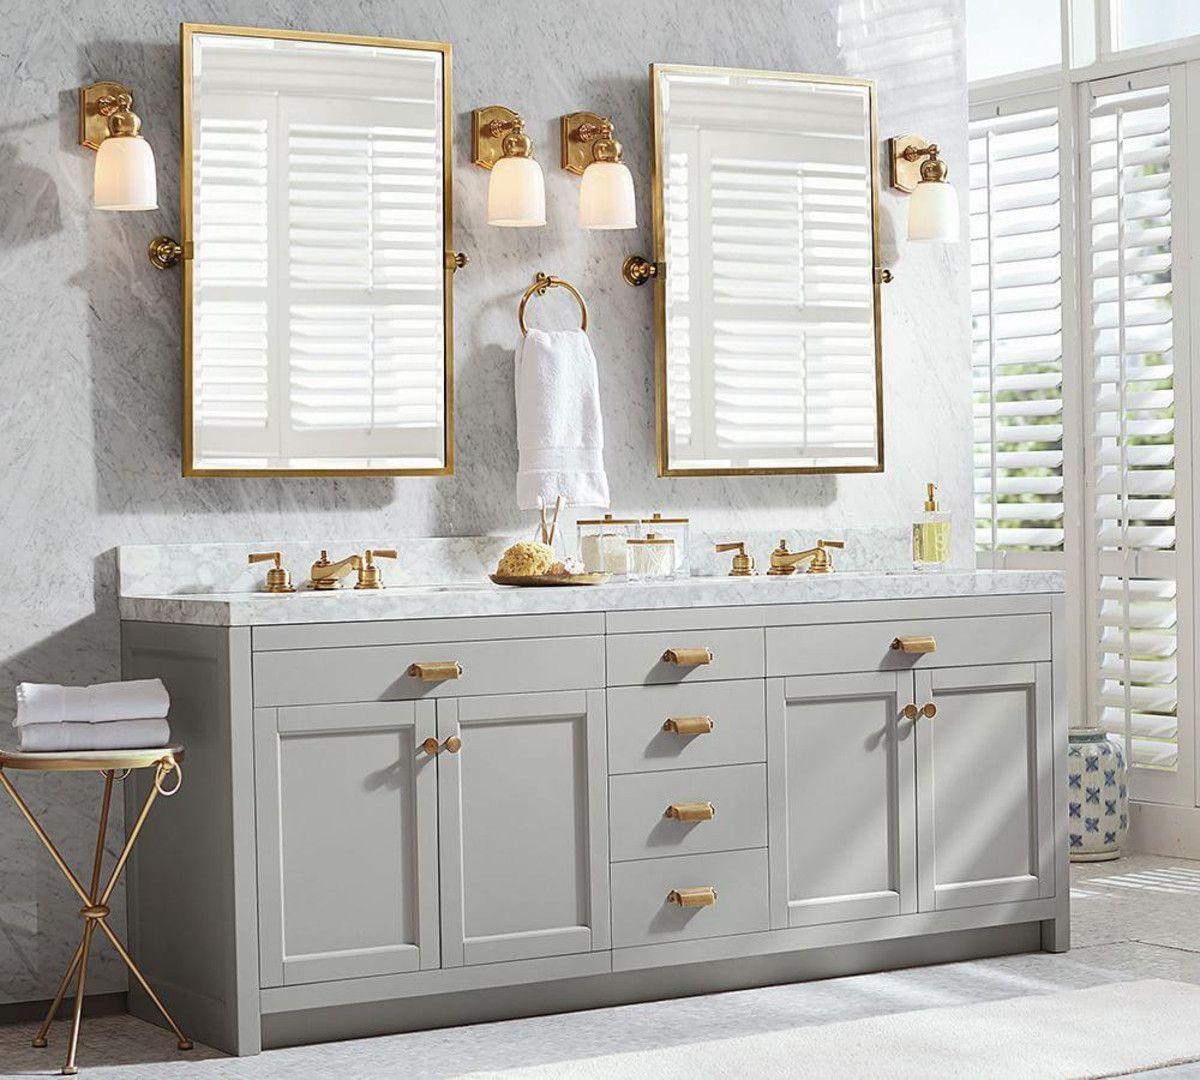 Kensington Pivot Rectangular Mirror | Pottery, Barn and House